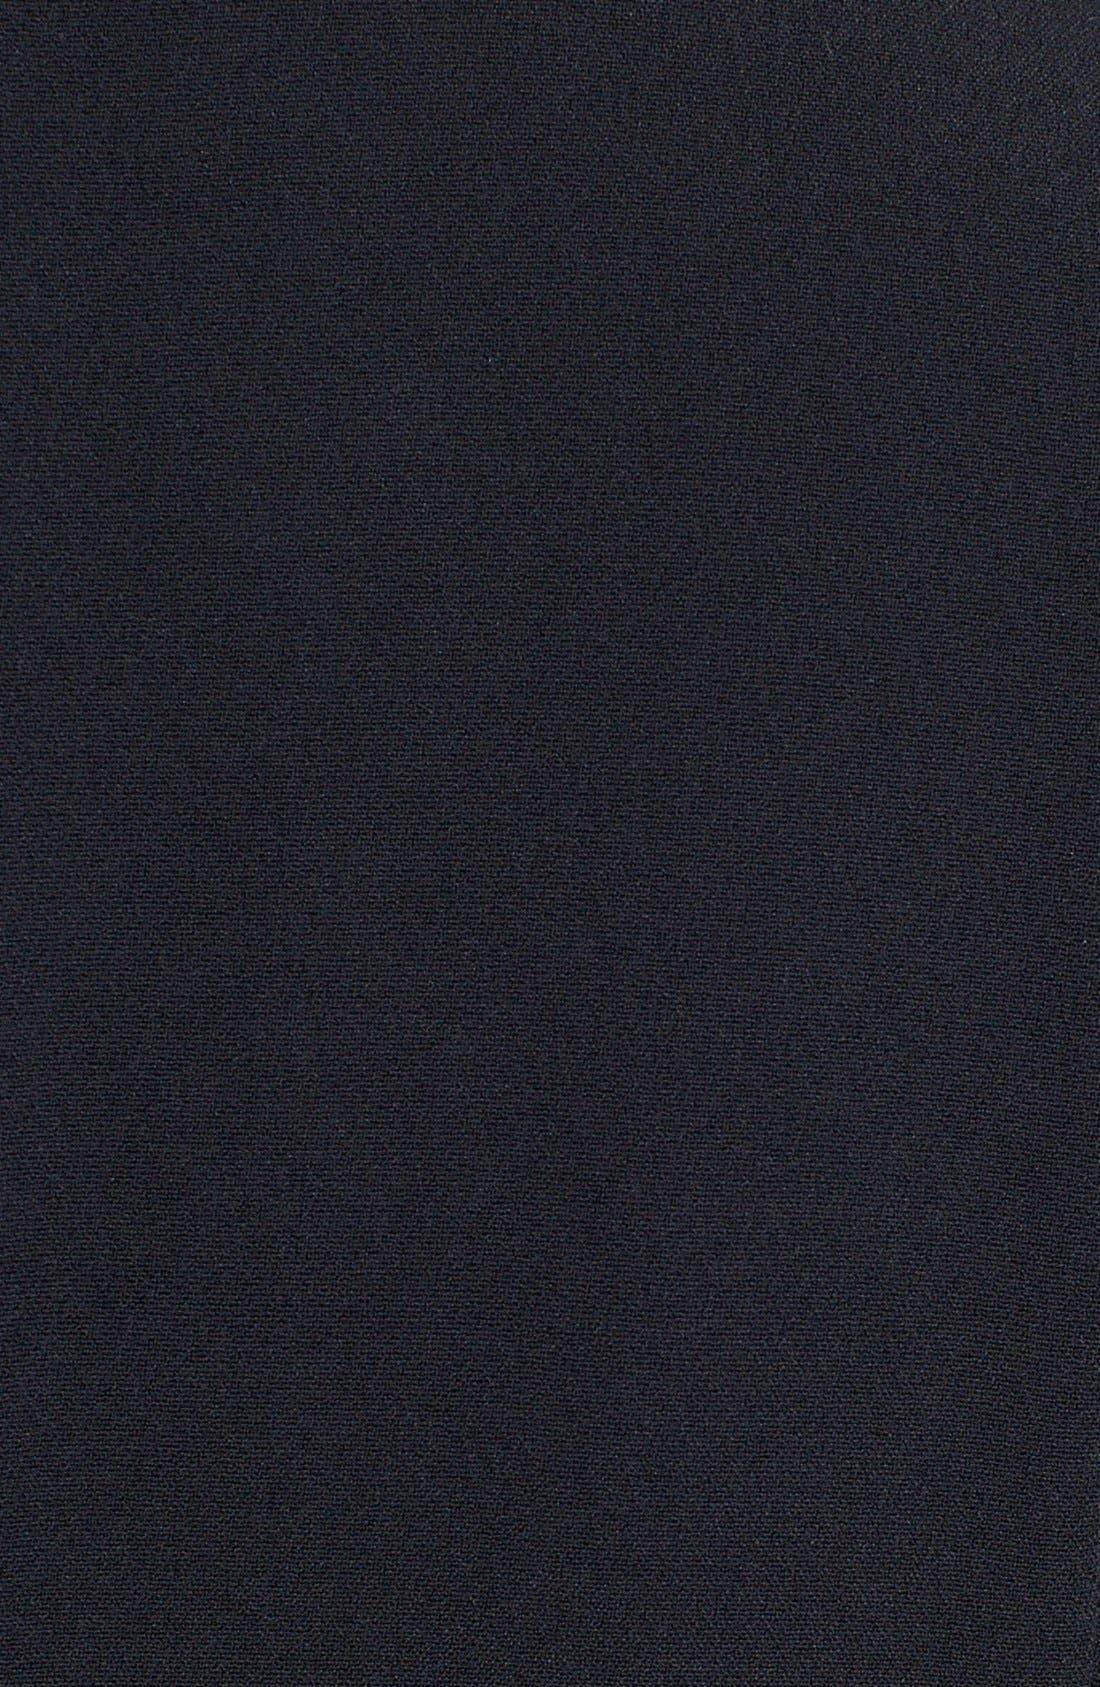 Alternate Image 3  - Dolce&Gabbana Mock Turtleneck Cady A-Line Dress